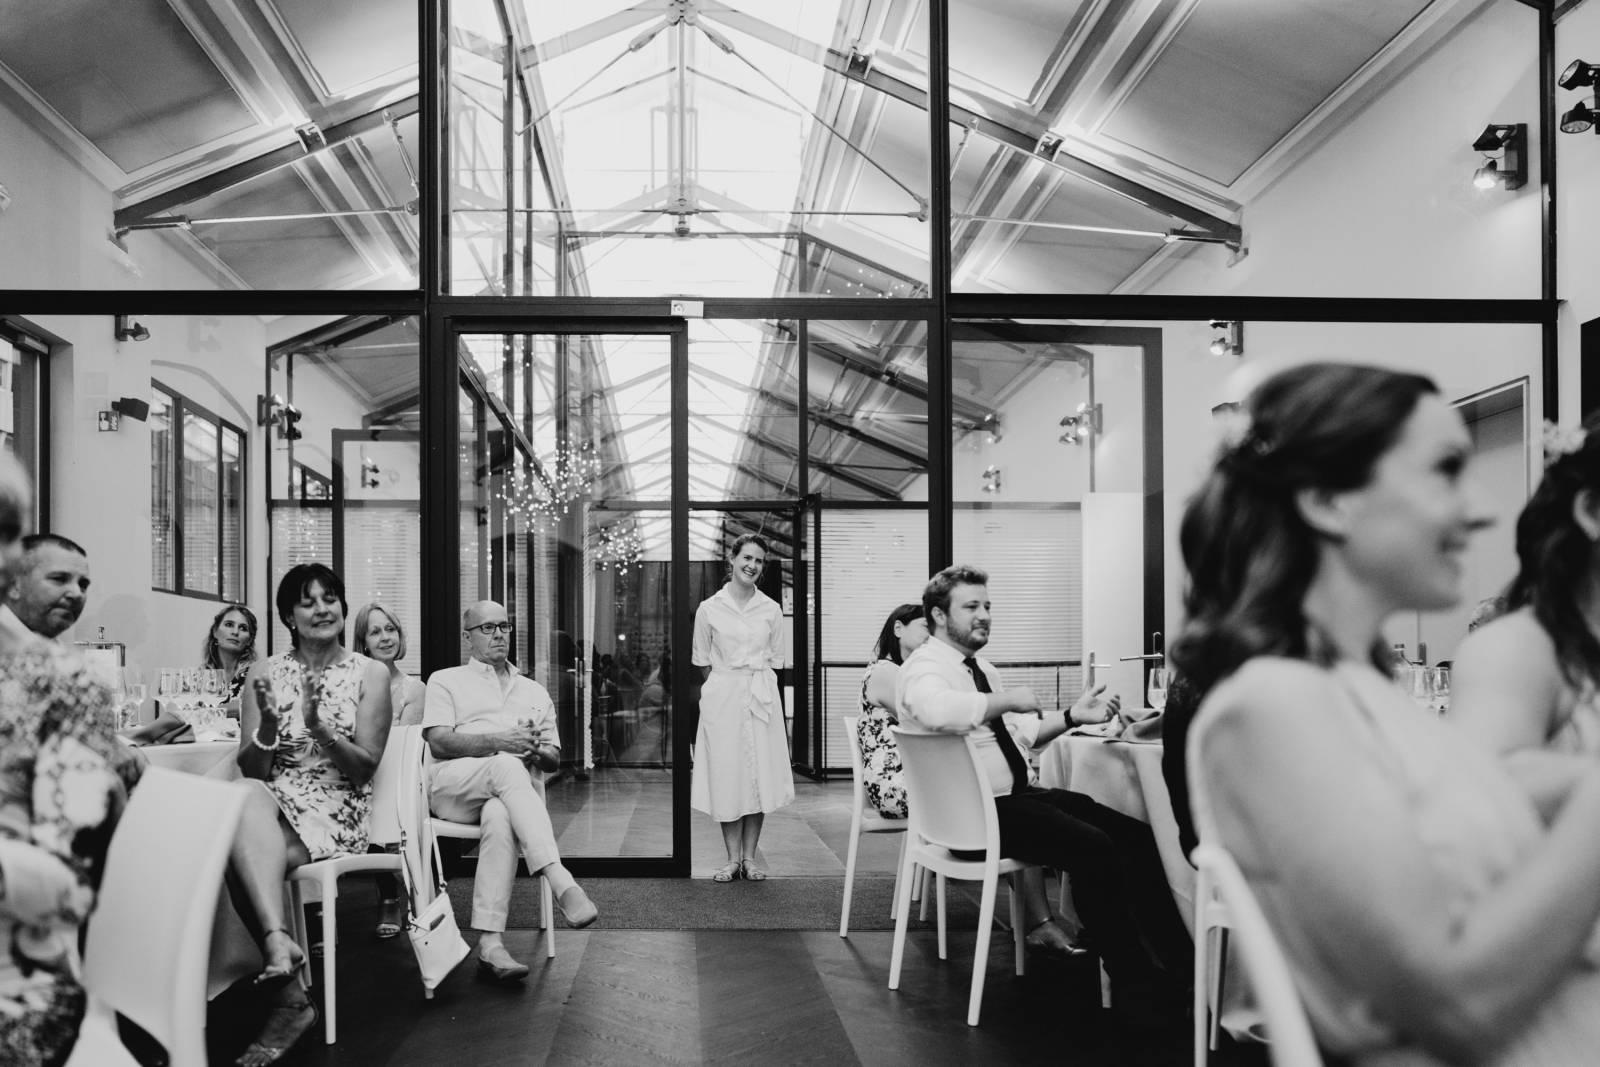 Elegant Events - Weddingplanner - Fotograaf Tom Leuntjens Photography - House of Weddings (8)